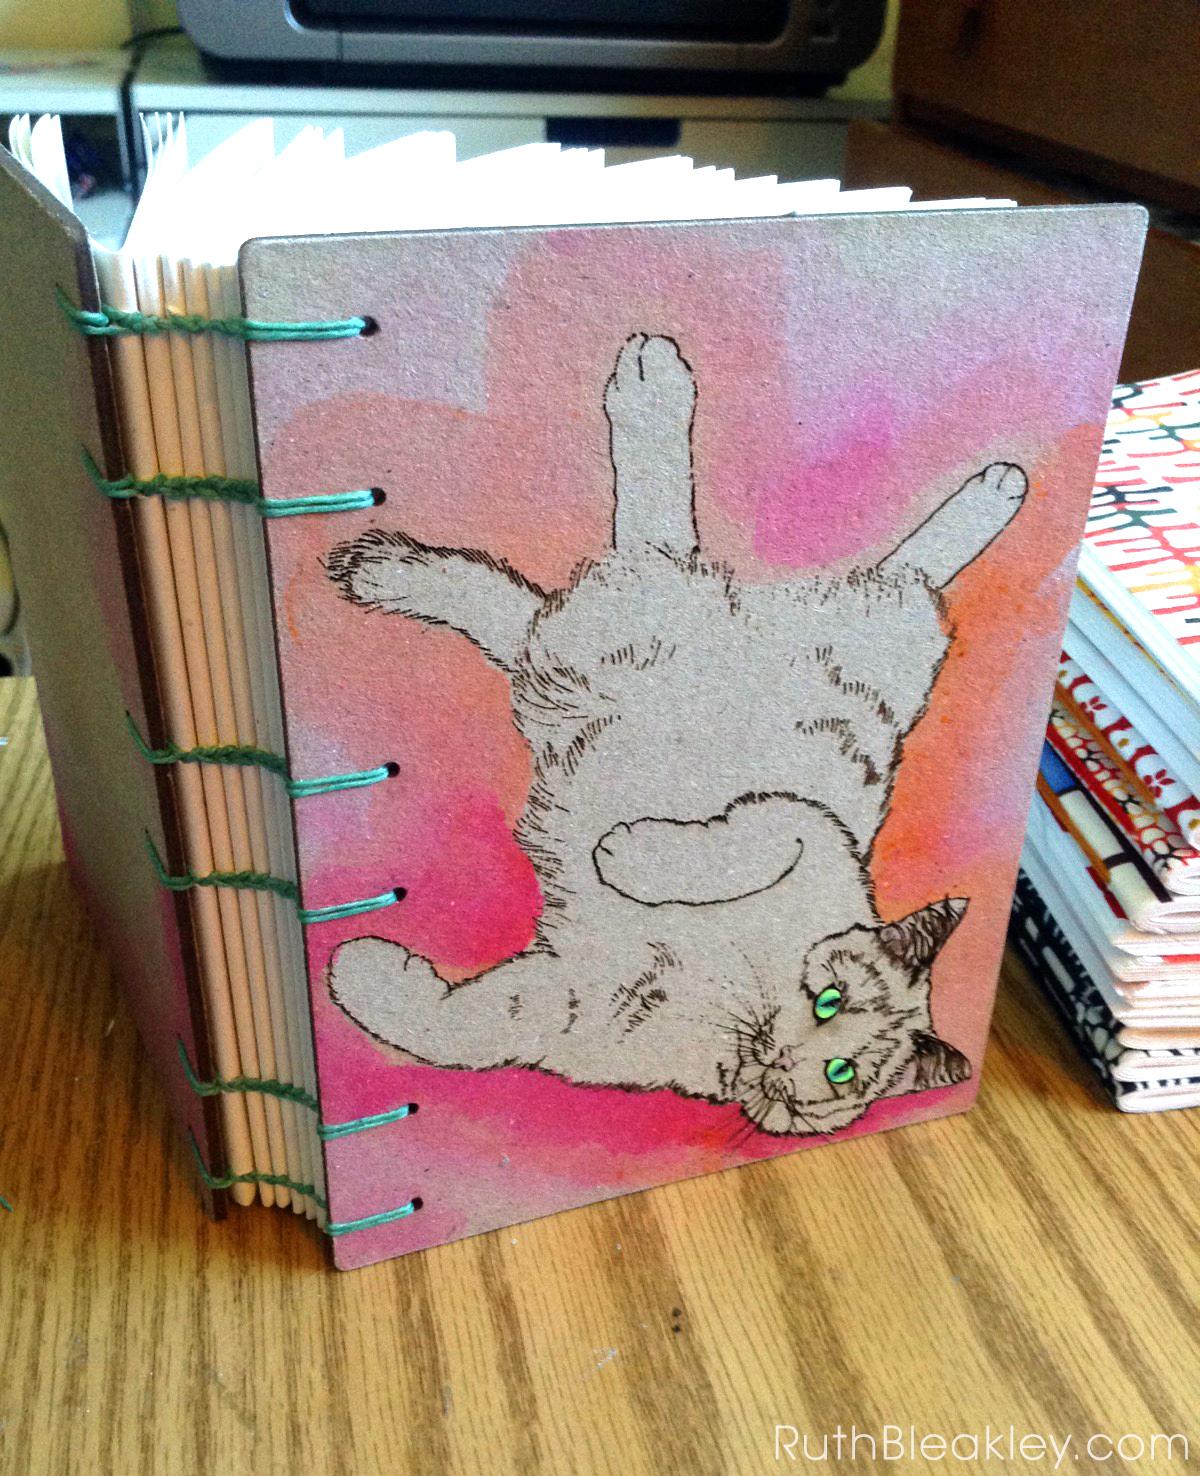 Orange and Pink Cat Journal progress photos handmade by book artist Ruth Bleakley - 4